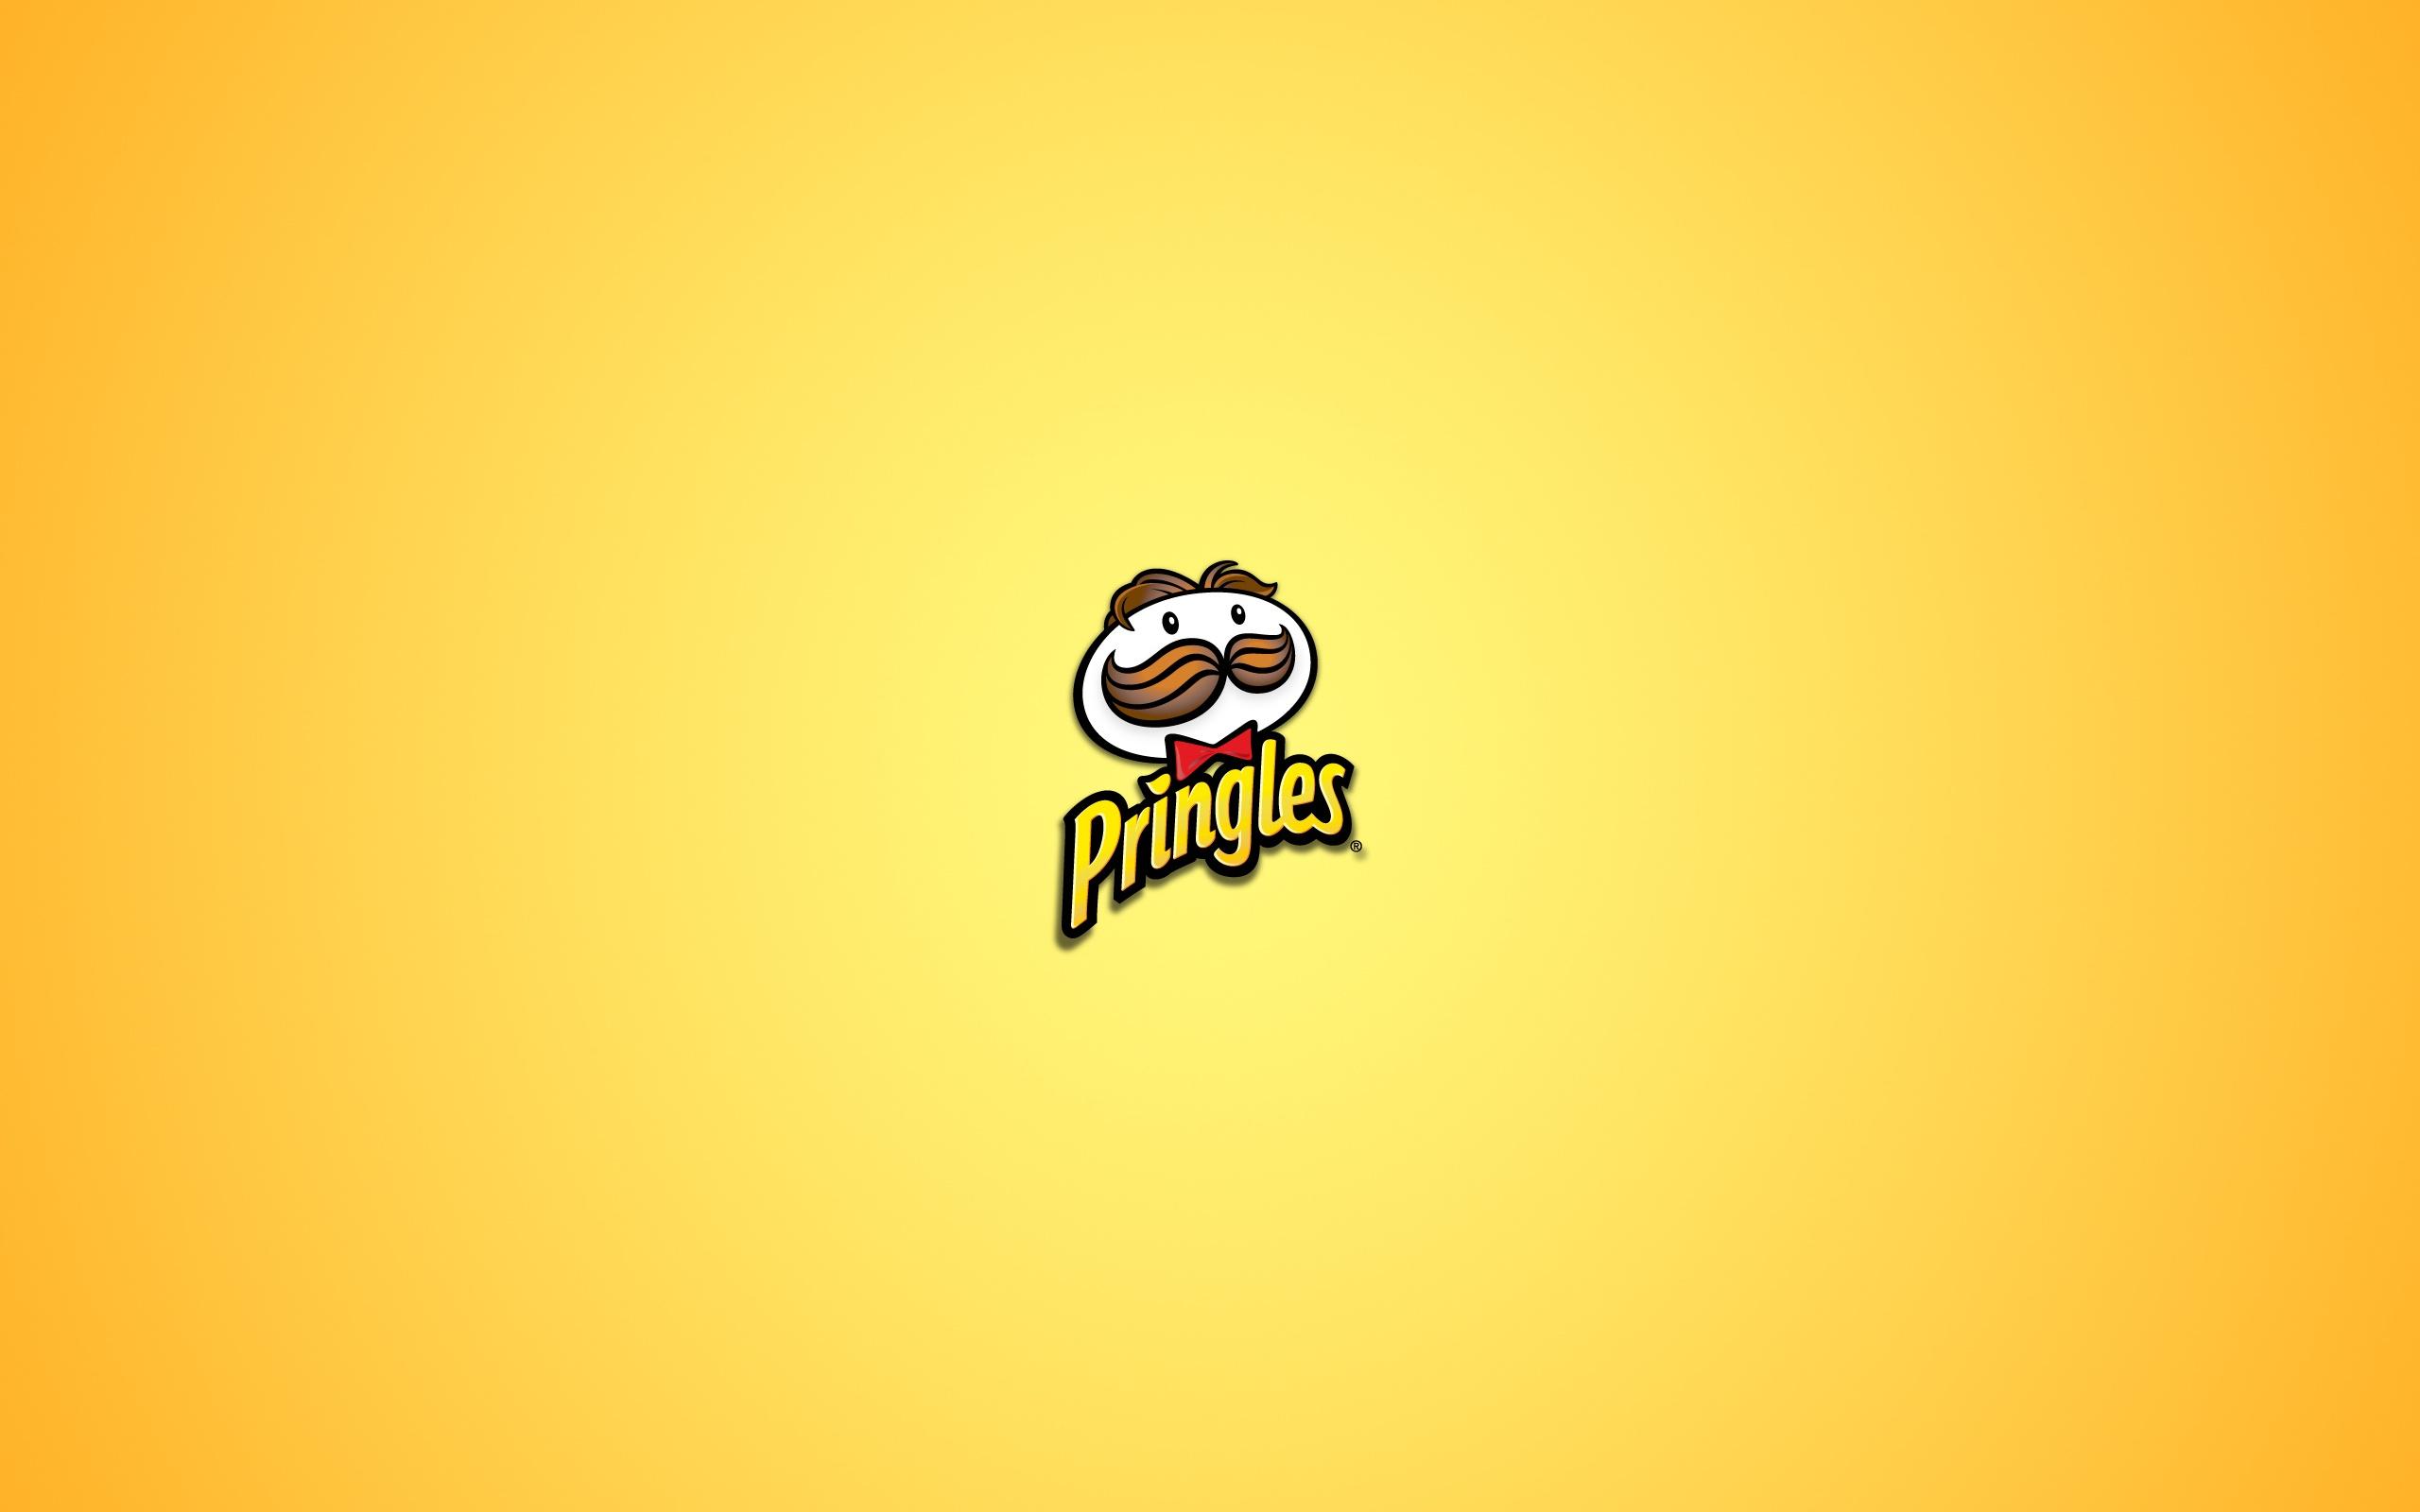 Pringles Logo wallpaper Best HD Wallpapers 2560x1600